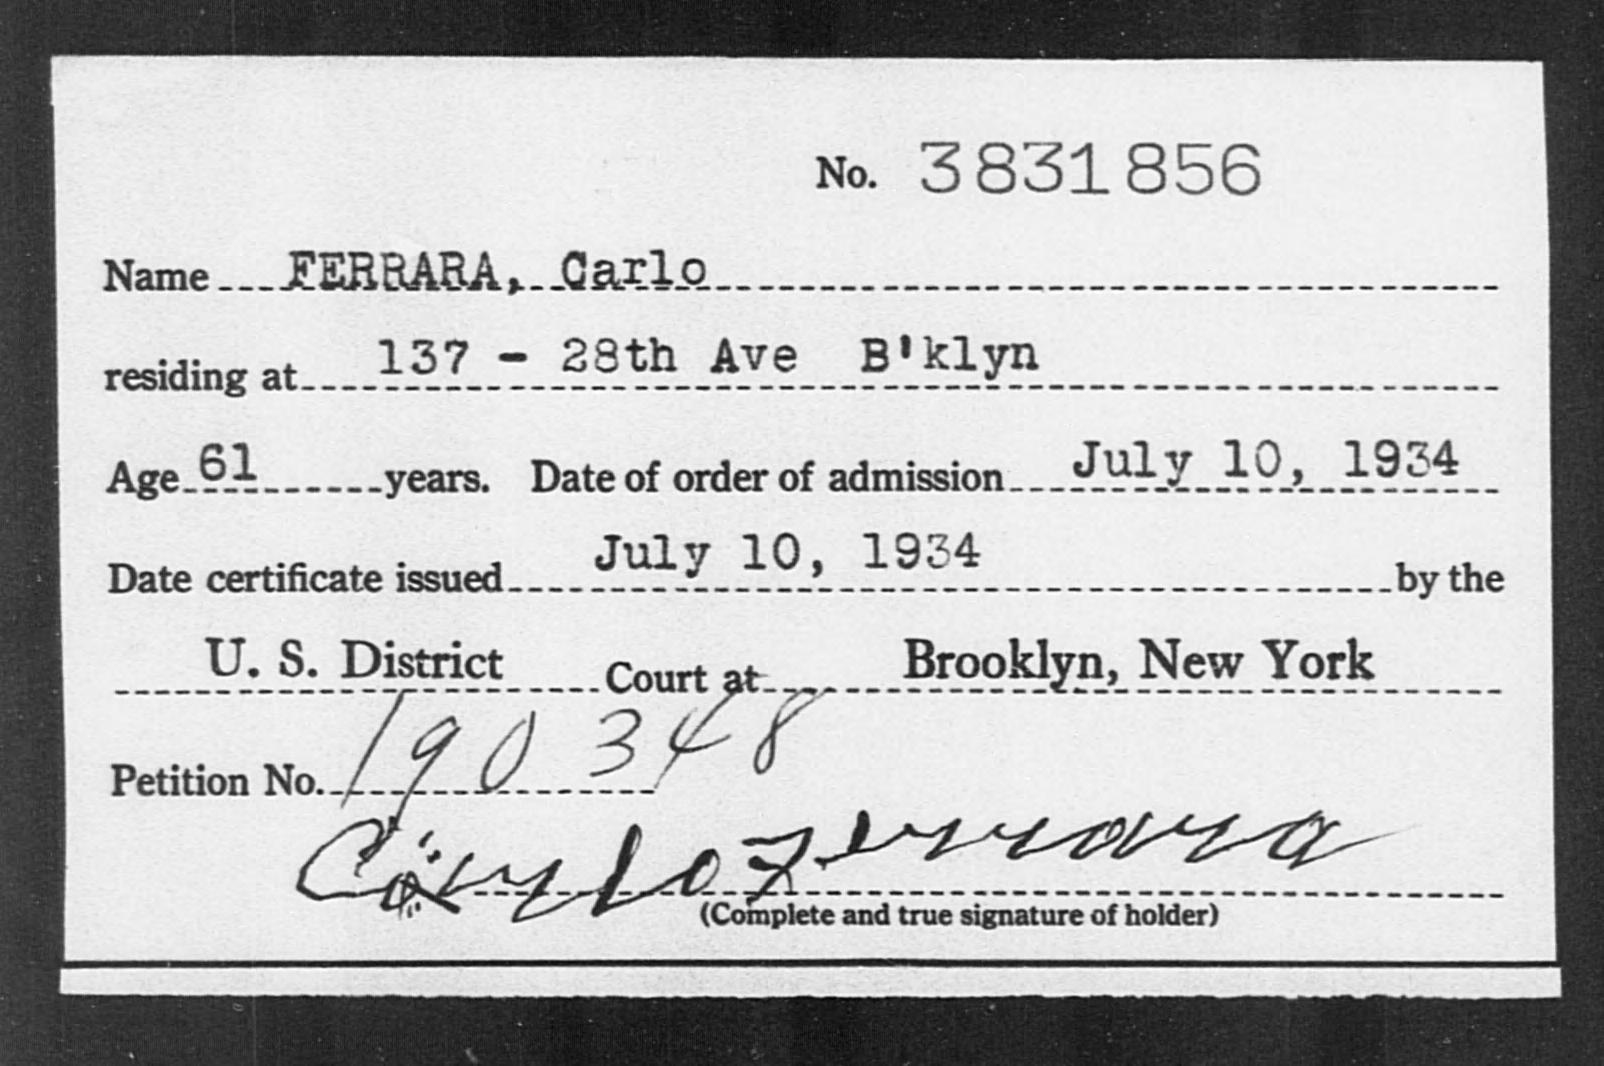 FERRARA, Carlo - Born: [BLANK], Naturalized: 1934